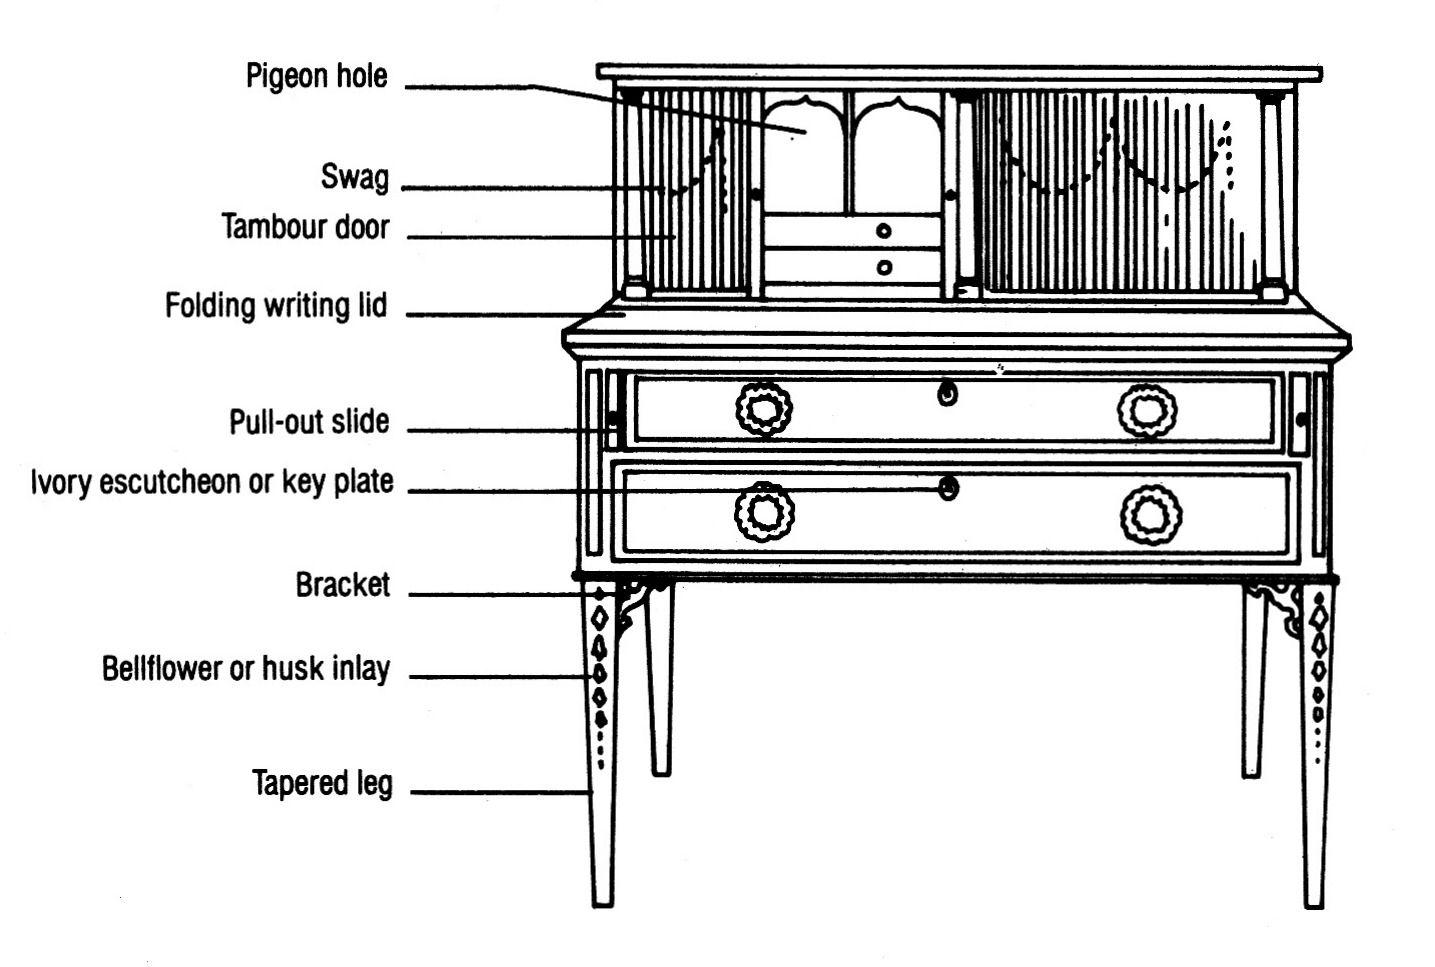 Diagram Of Federal Tambour Desk 1794 1804 Boston By John And Thomas